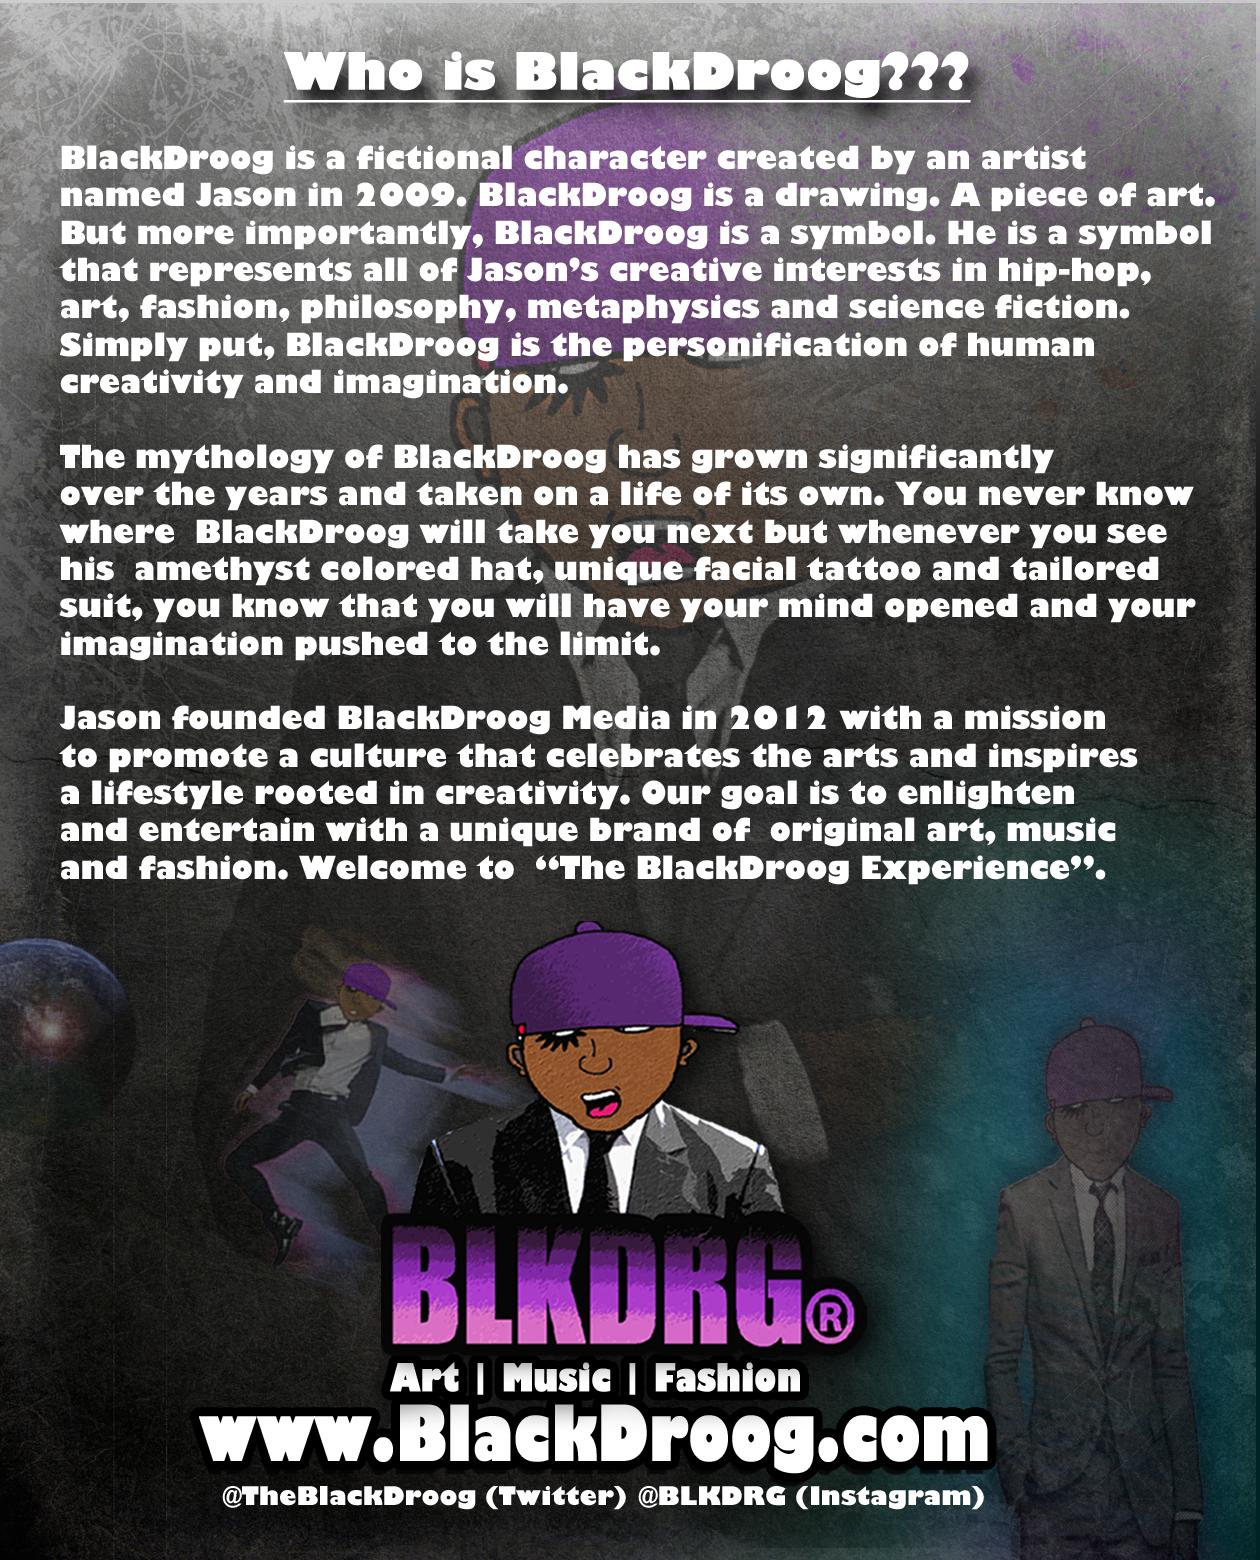 Who is BlackDroog